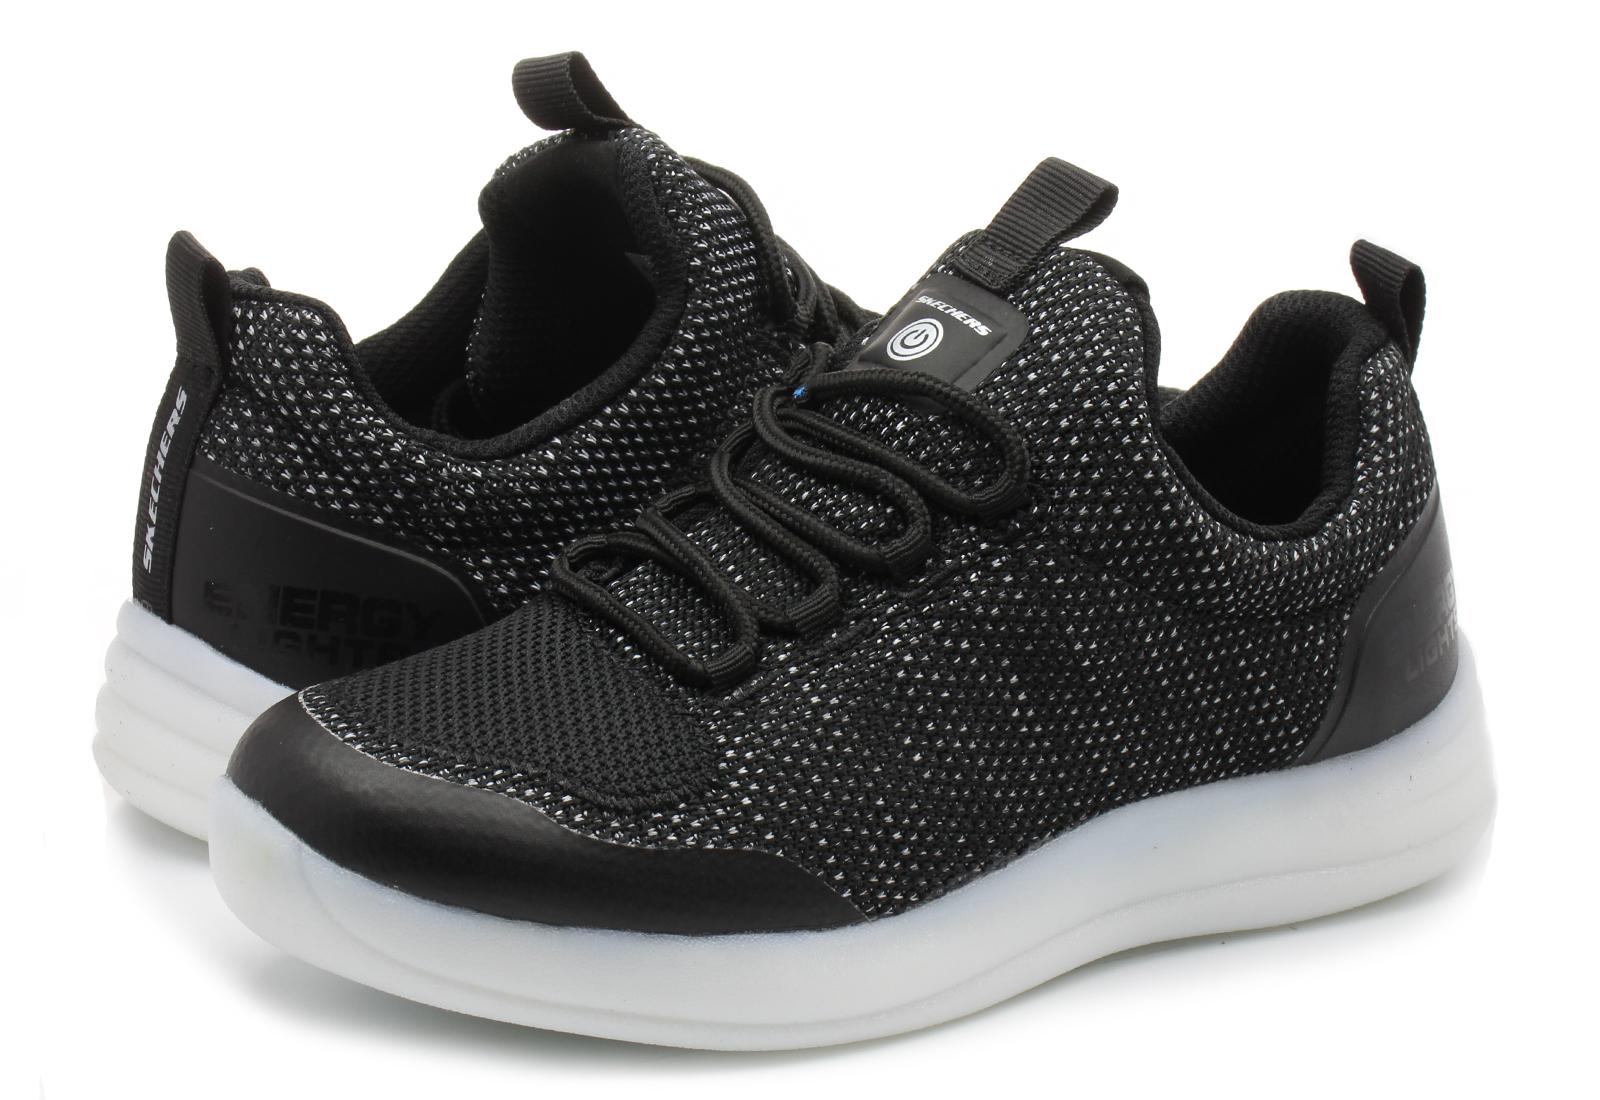 78a99b81870b Skechers Shoes - Energy Lights Street - 90642l-blk - Online shop for ...